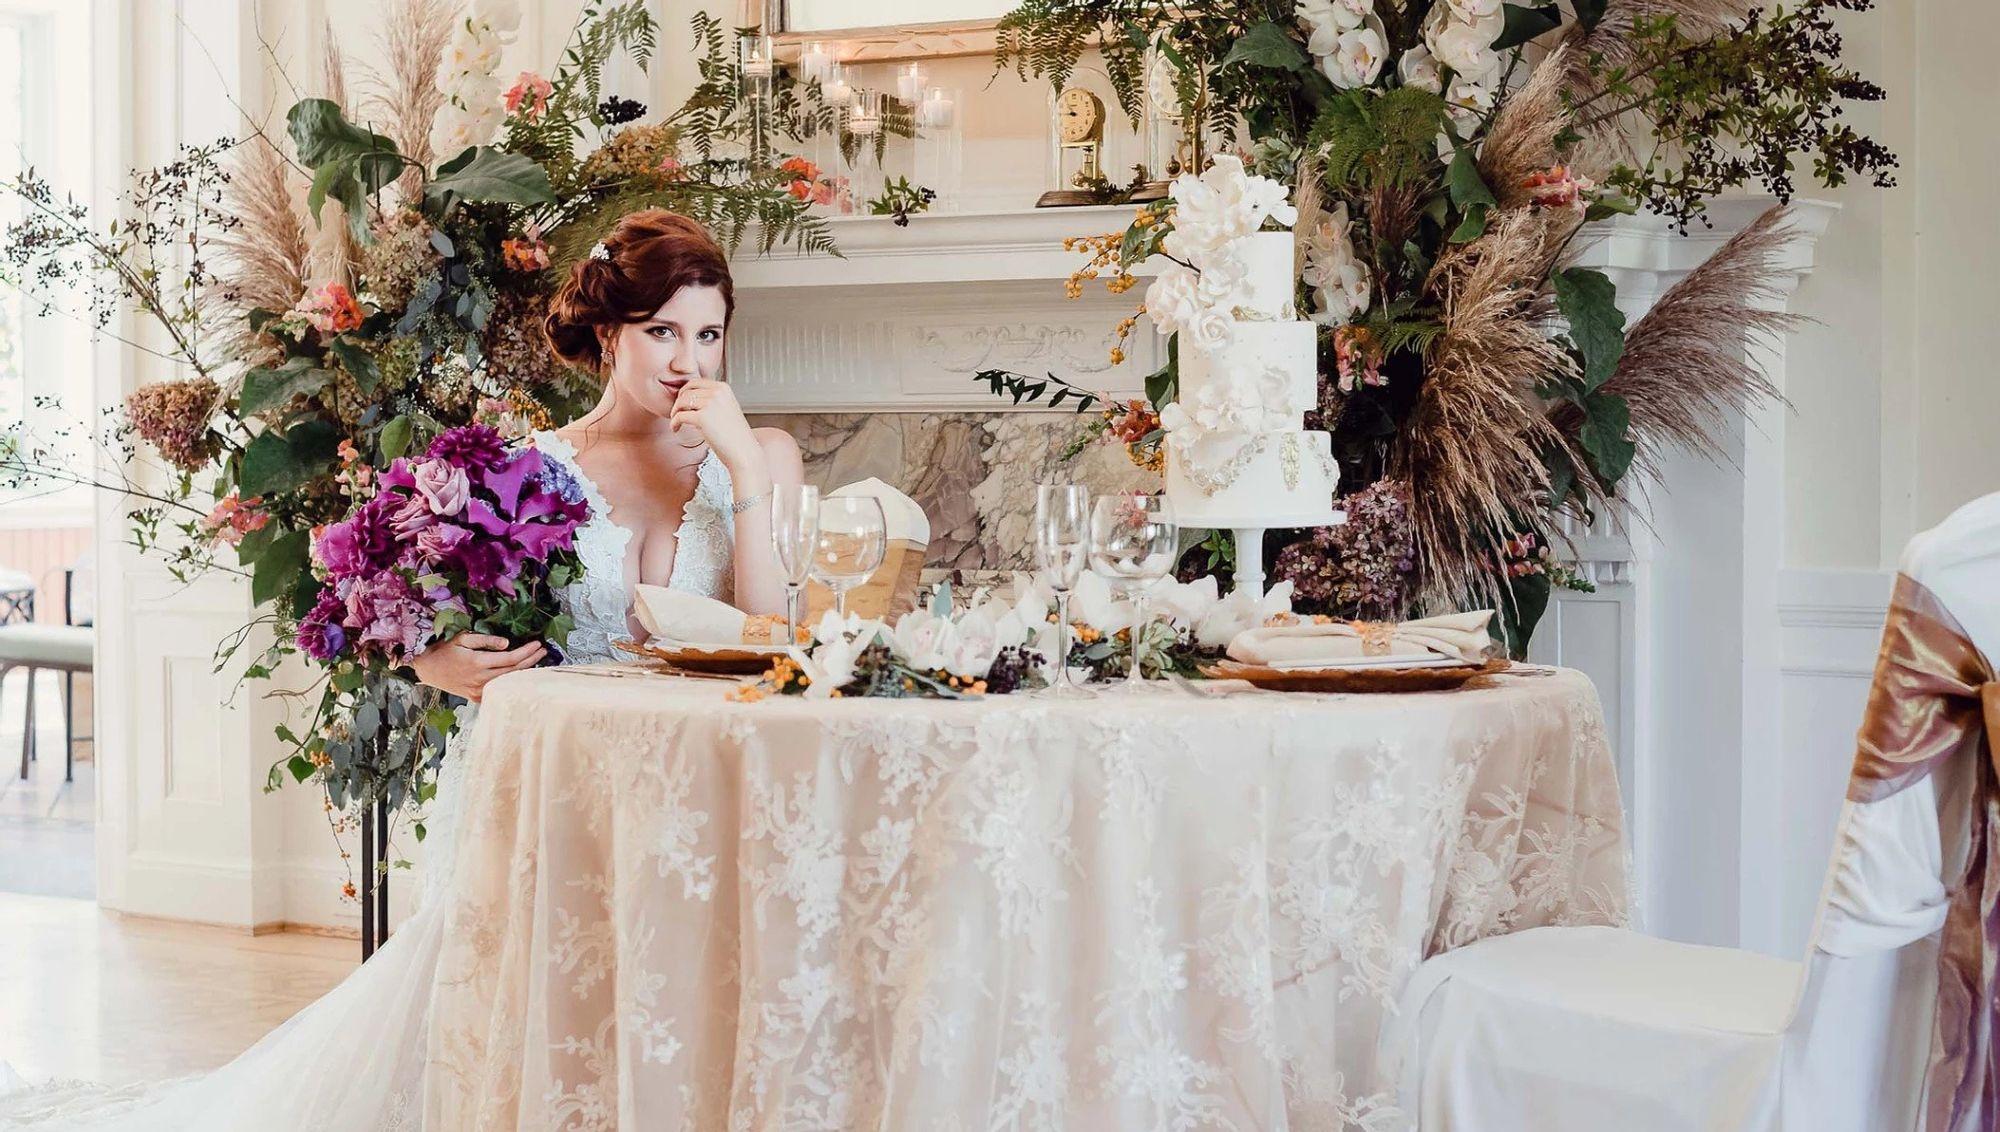 Farawayland Weddings Wedding & Engagement Photography Cover Image